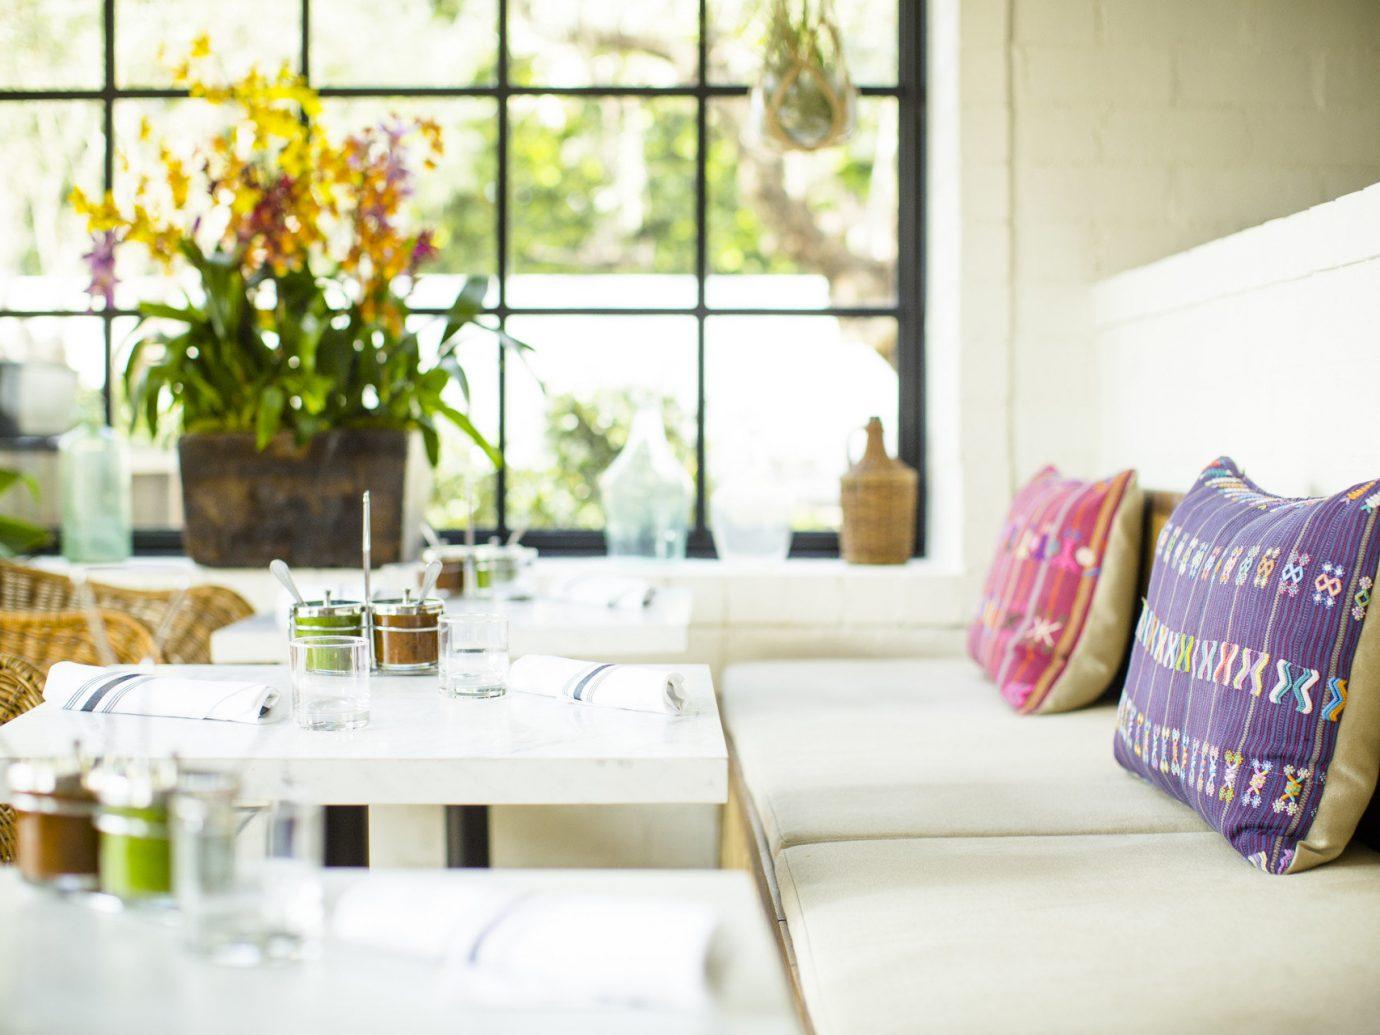 Travel Tips indoor color window room home living room interior design Design furniture cottage decorated